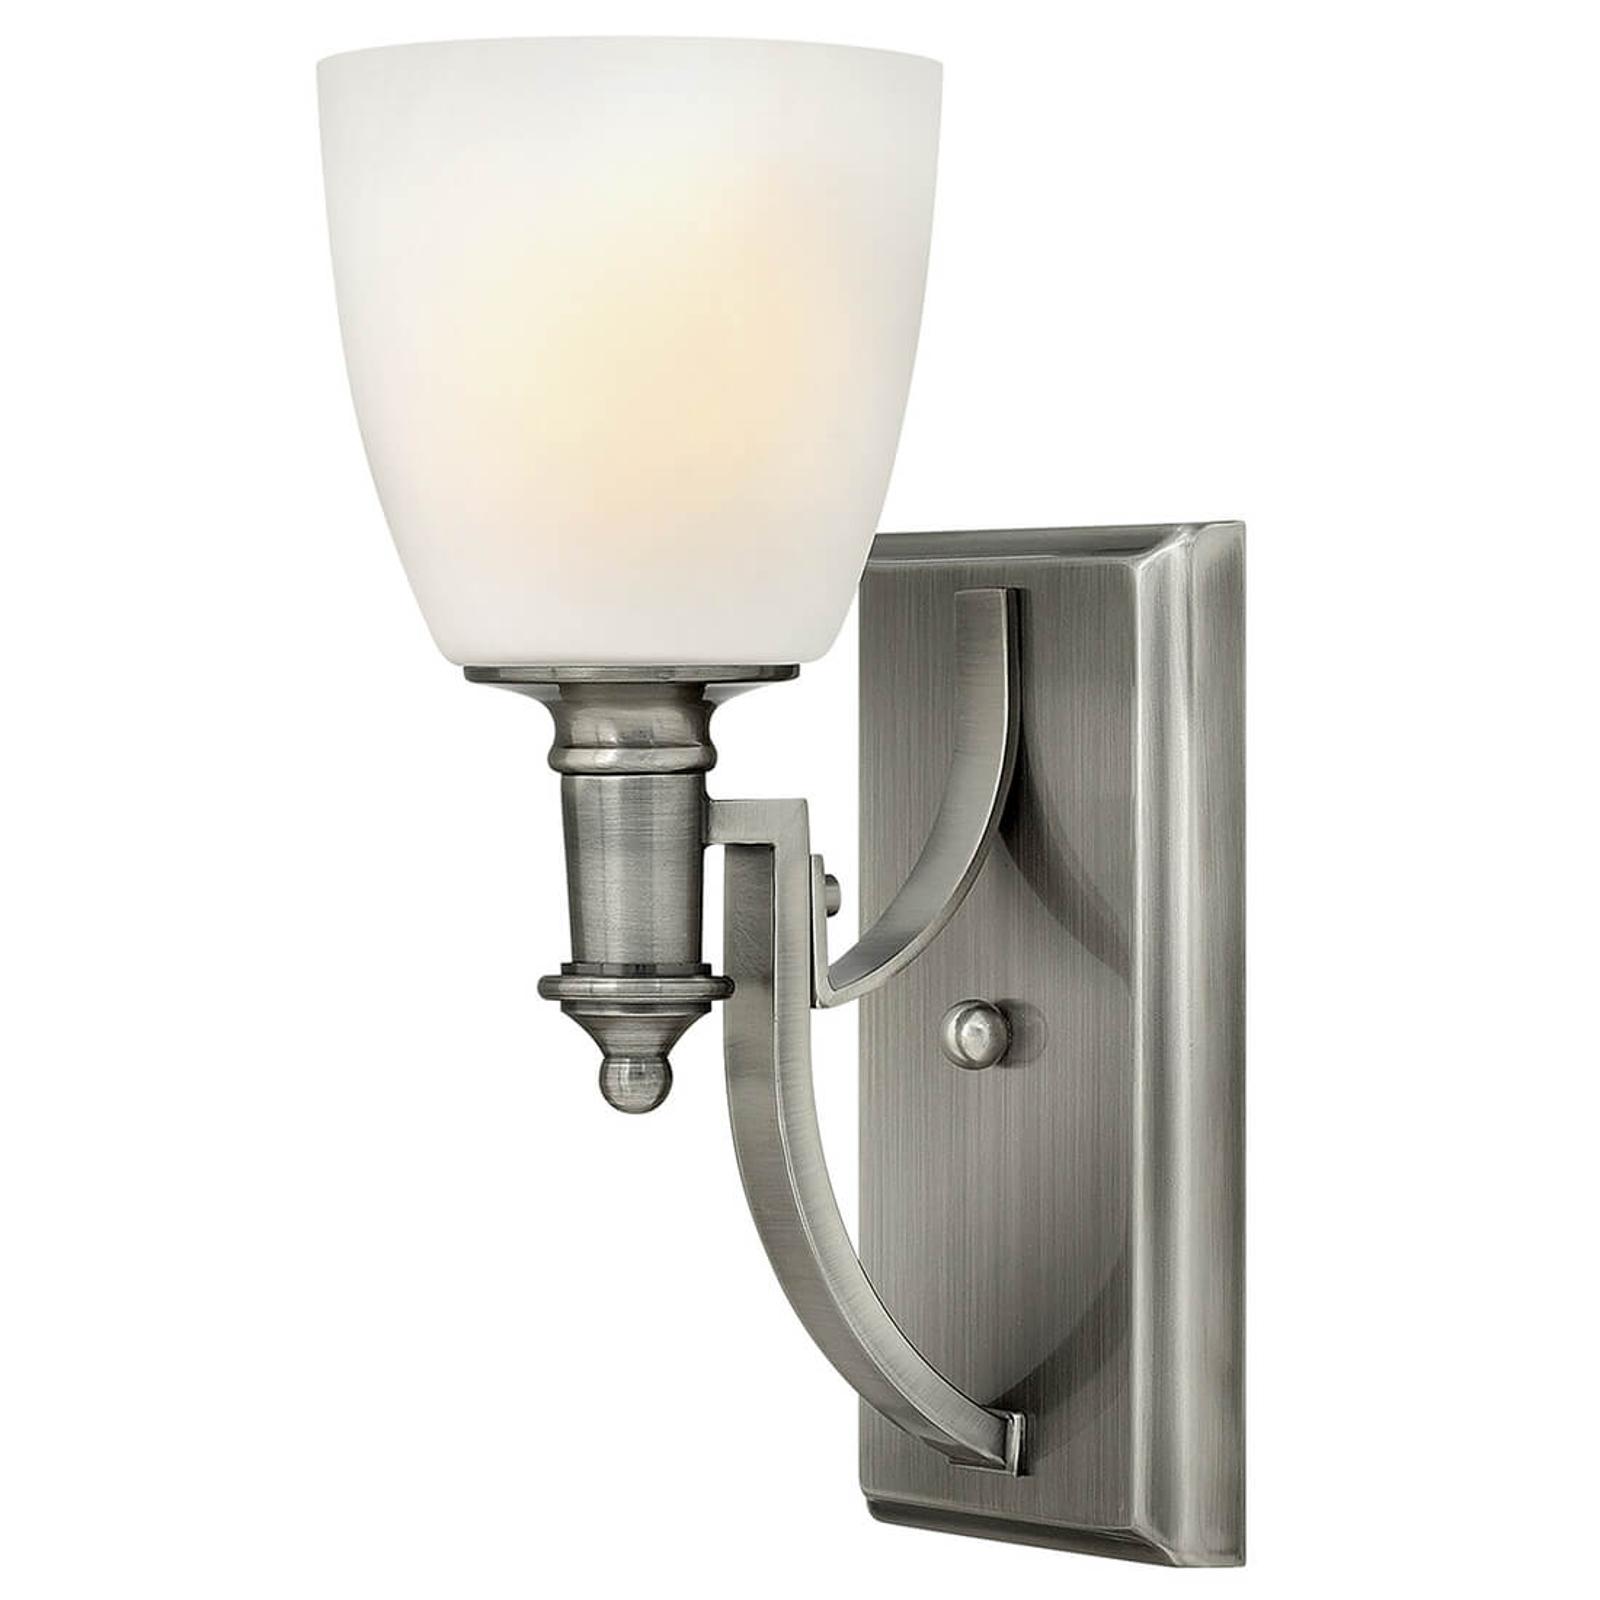 Antiek vernikkelde wandlamp Truman